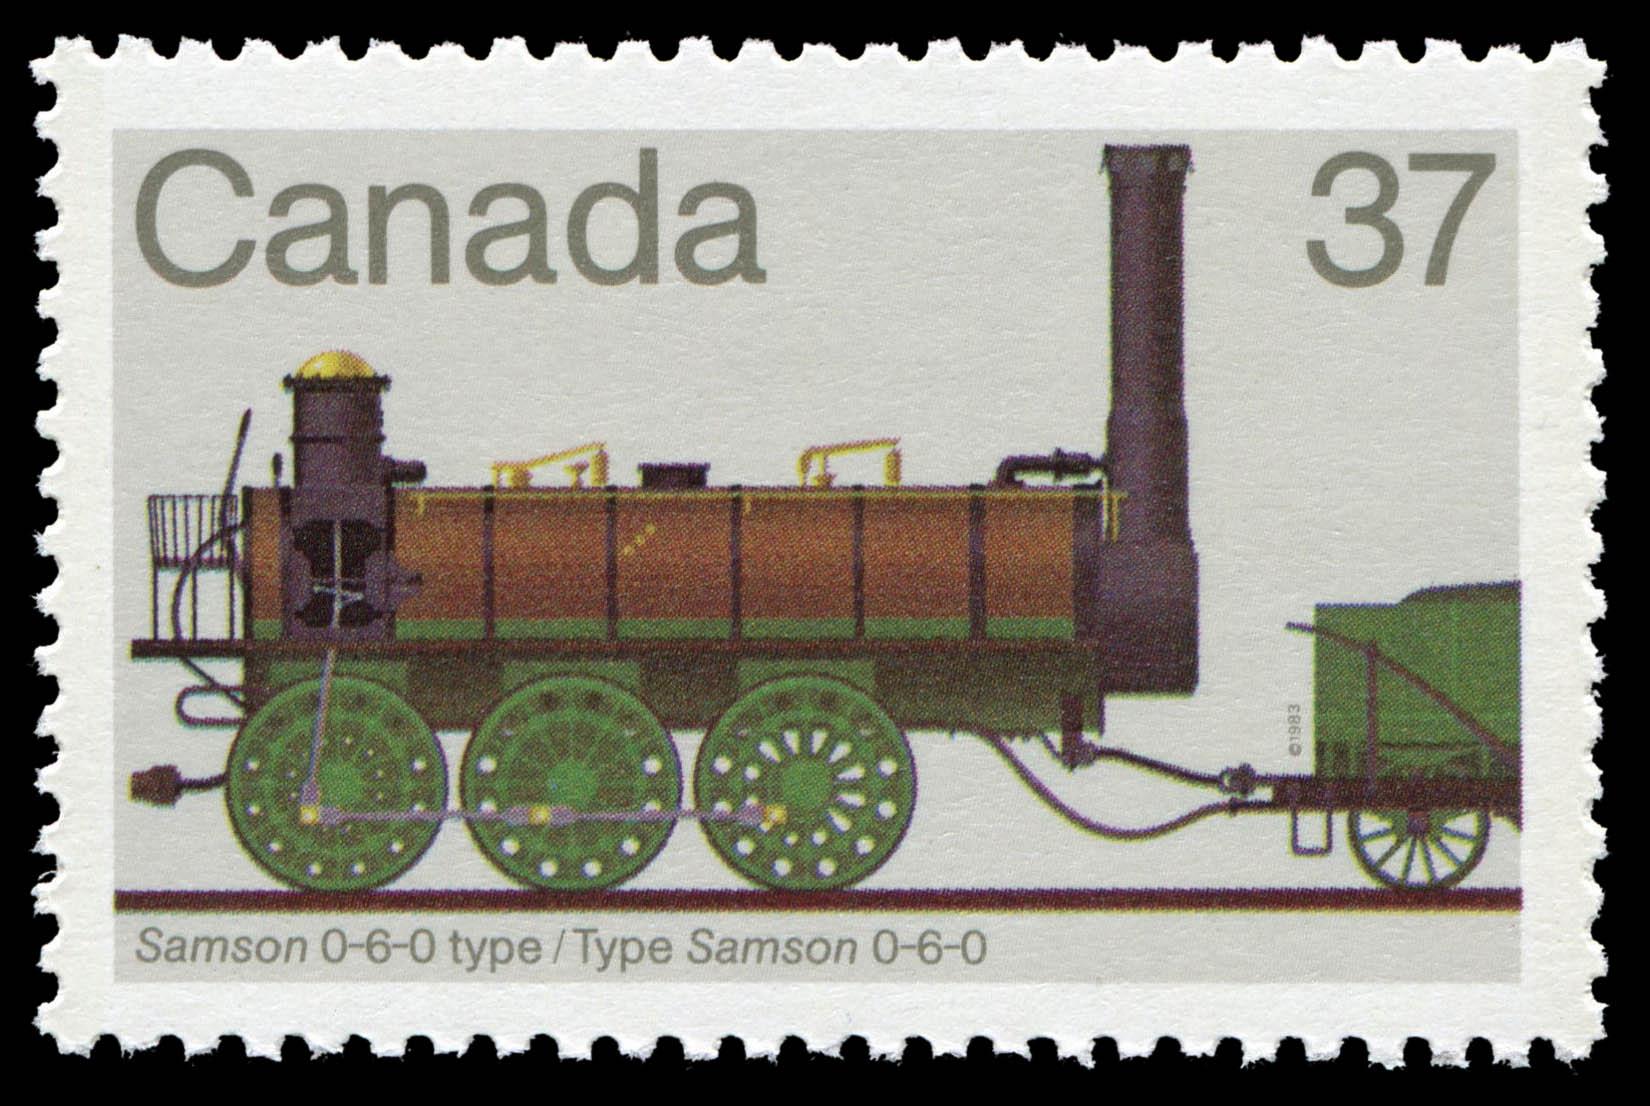 Samson 0-6-0 Type Canada Postage Stamp